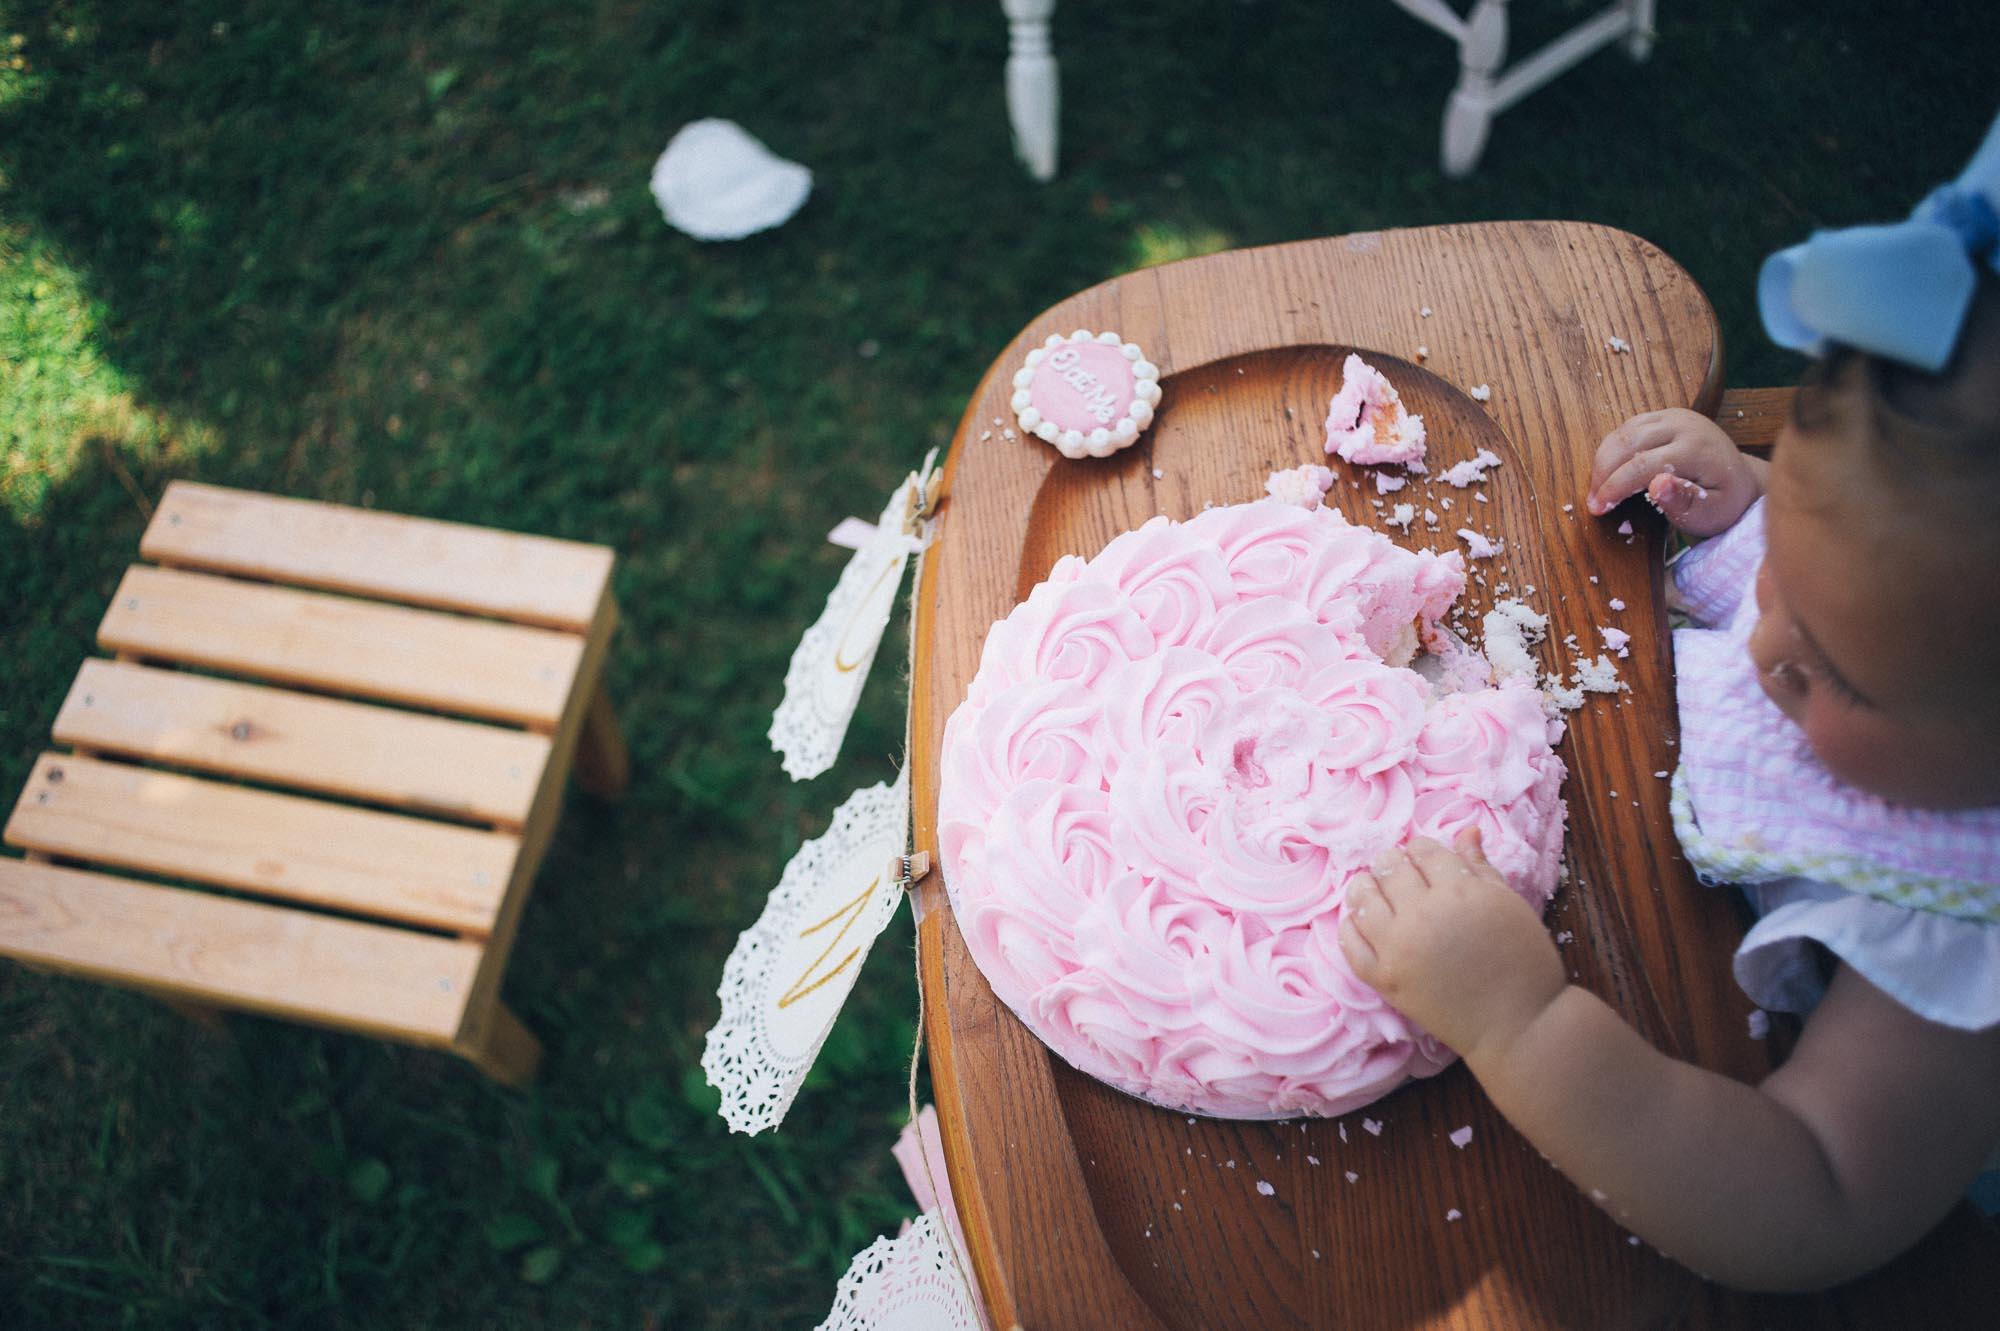 m.newsom-photography-one-year-old-girls-birthday-party-ideas-alice-in-wonderland (42 of 42).jpg